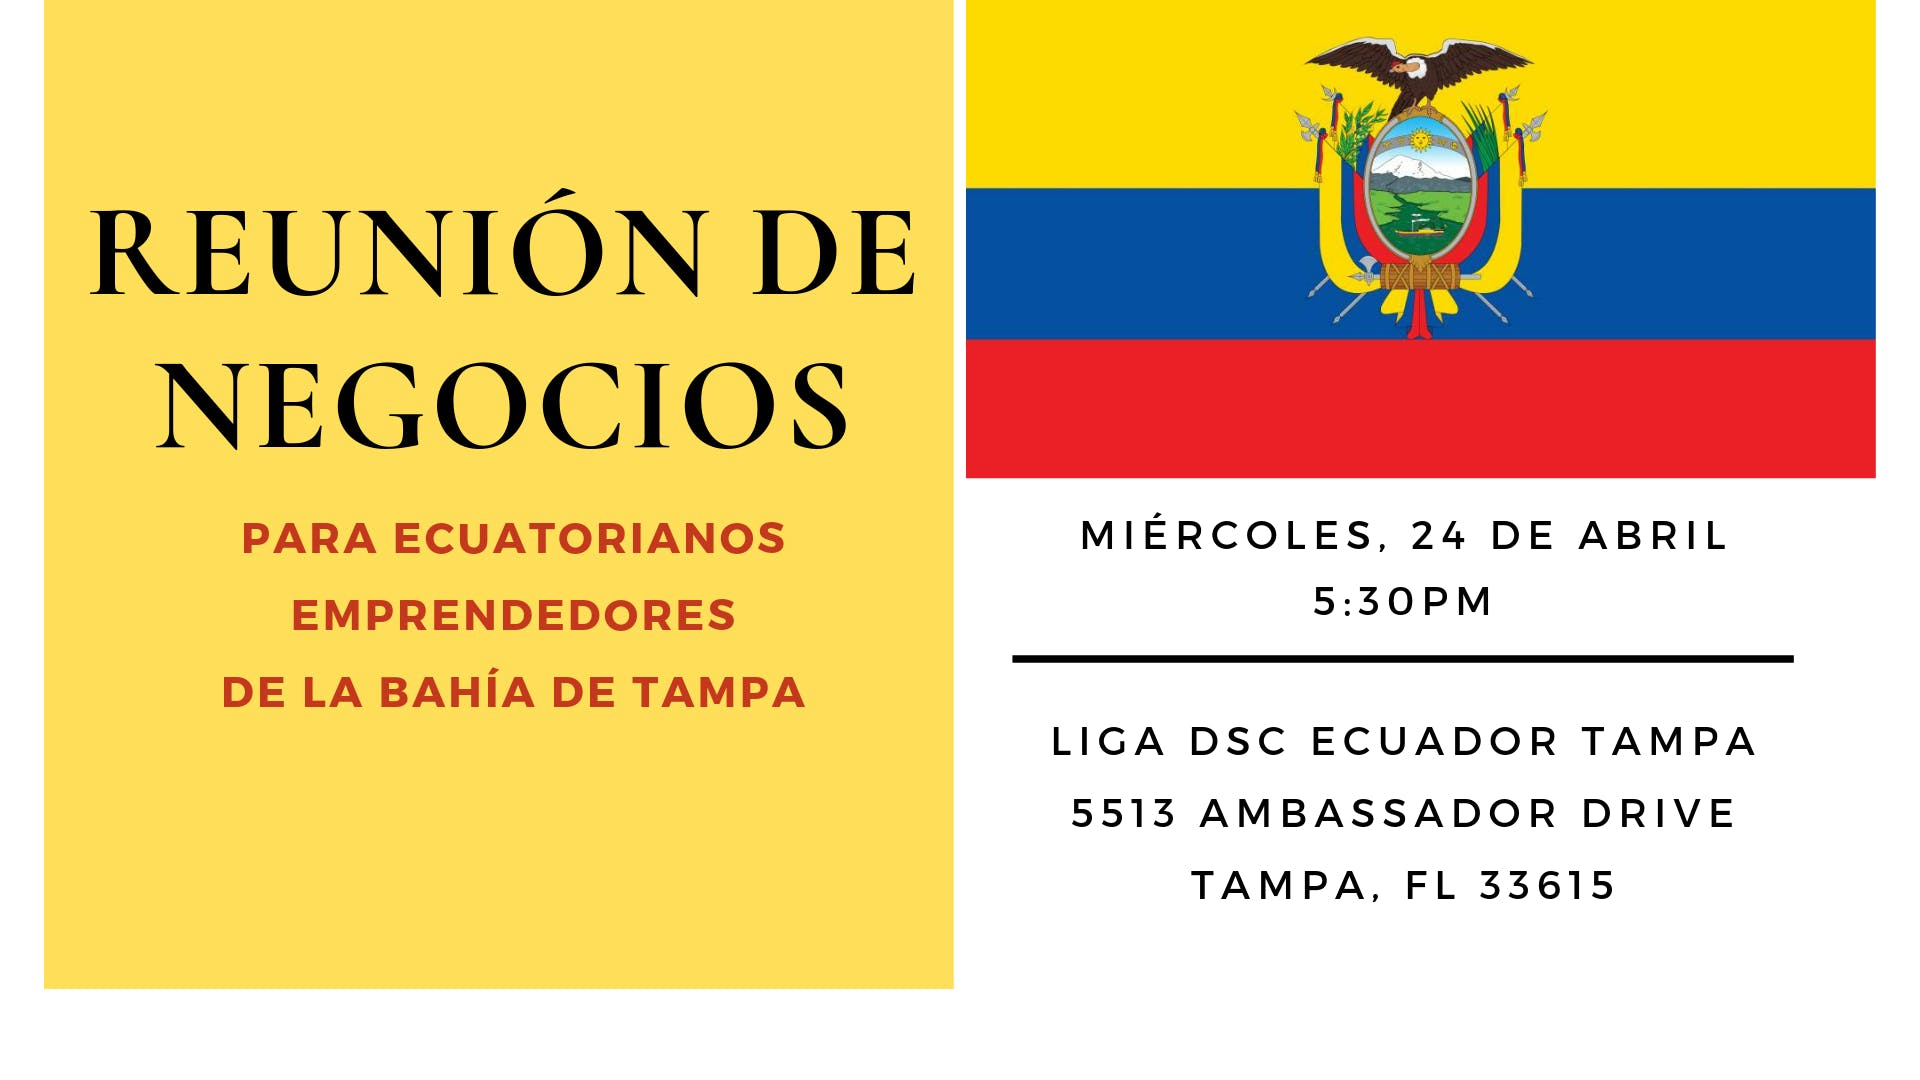 Reunión de Negocios Para Ecuatorianos Emprendedores de la Bahía de Tampa